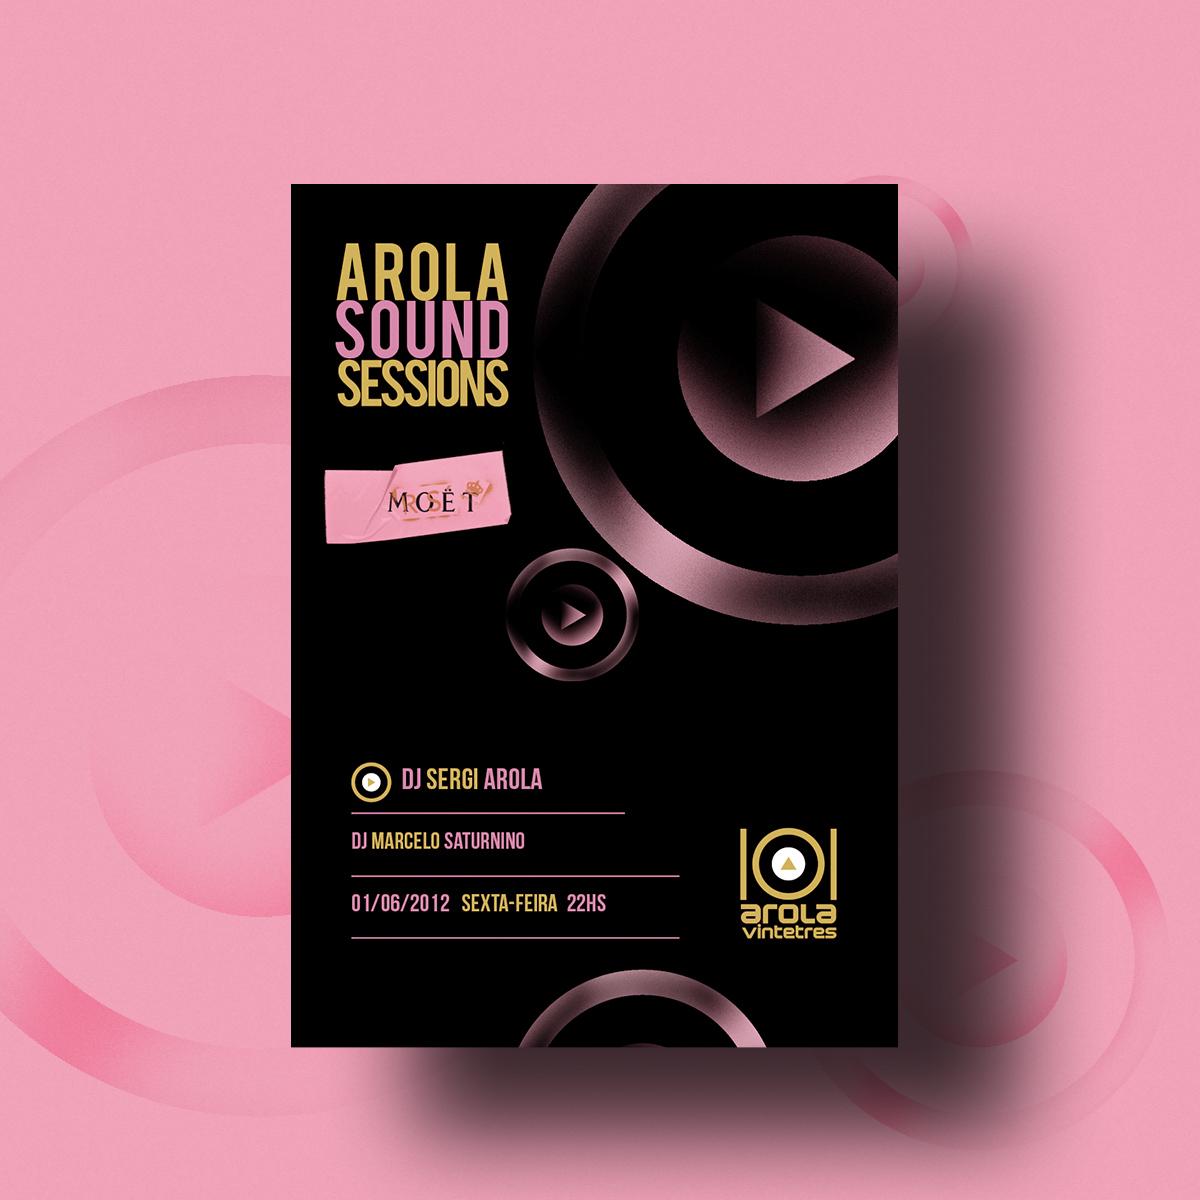 Arola Sound Sessions